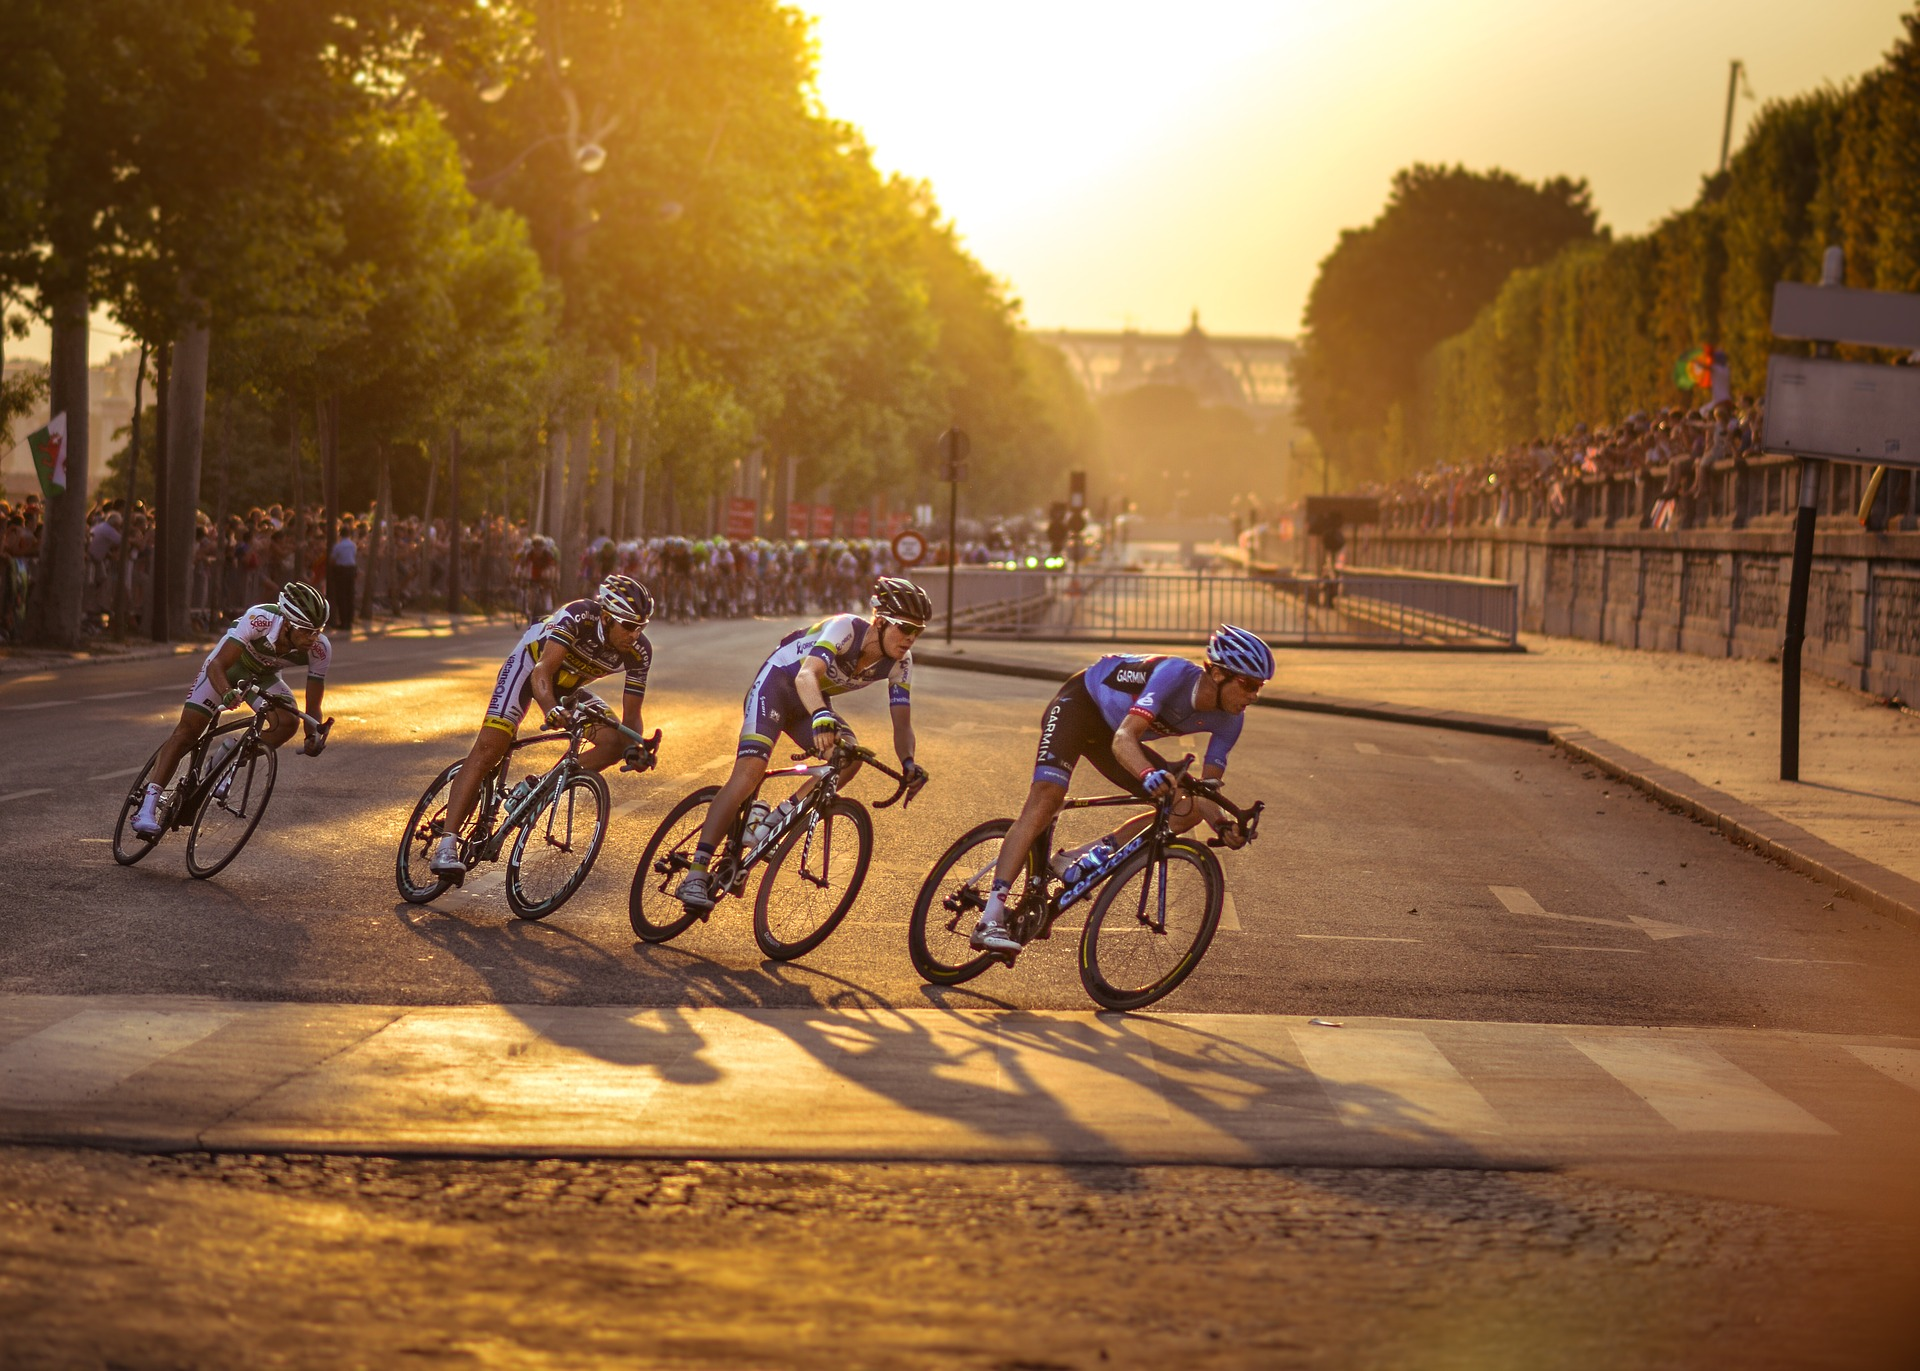 cyclists-917307_1920